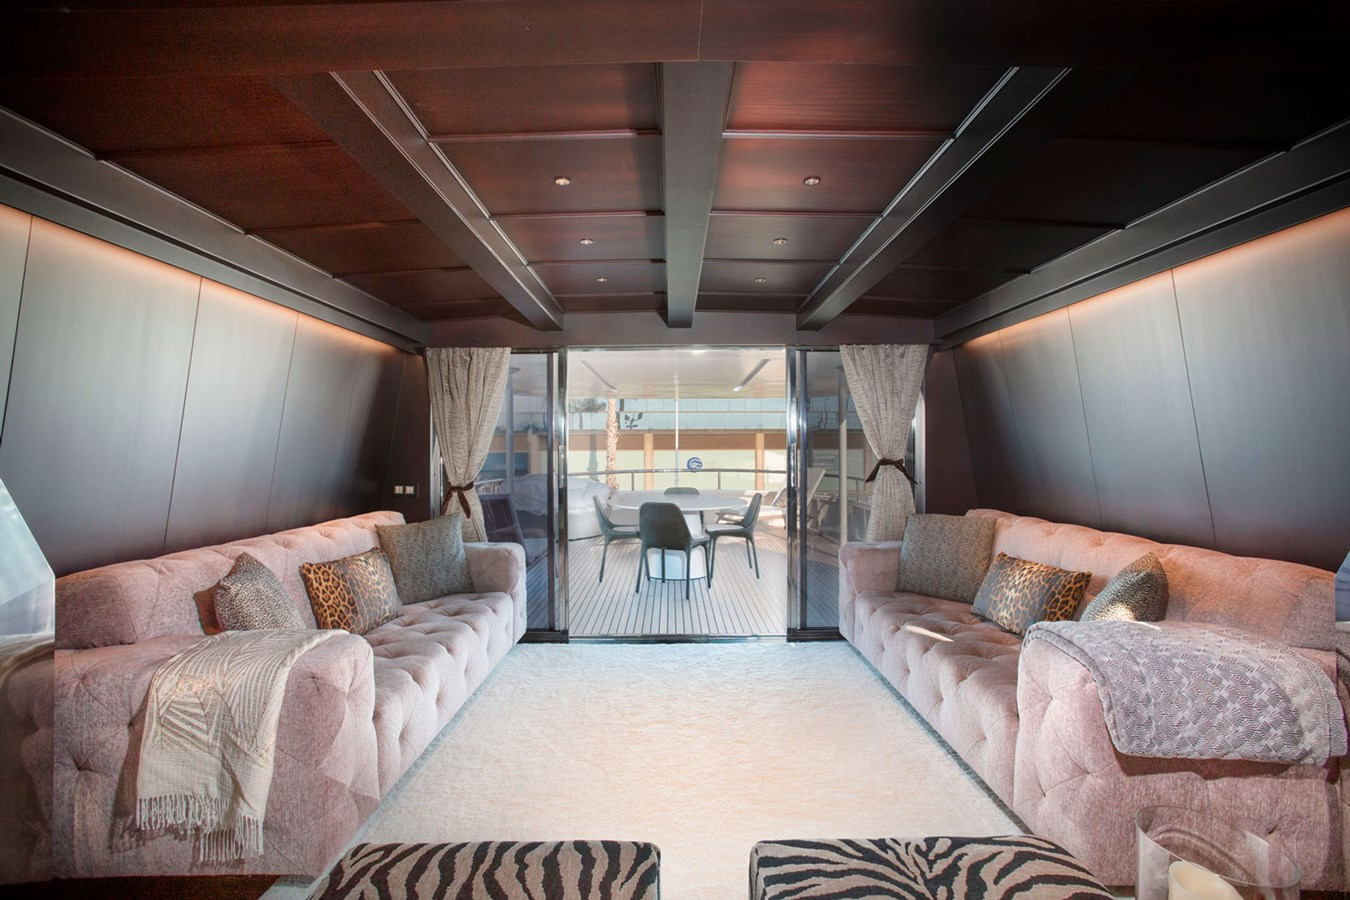 Witsen-and-vis-33m-Yacht-Sky-lounge-2 1971 Witsen & Vis  Motor Yacht 2681028